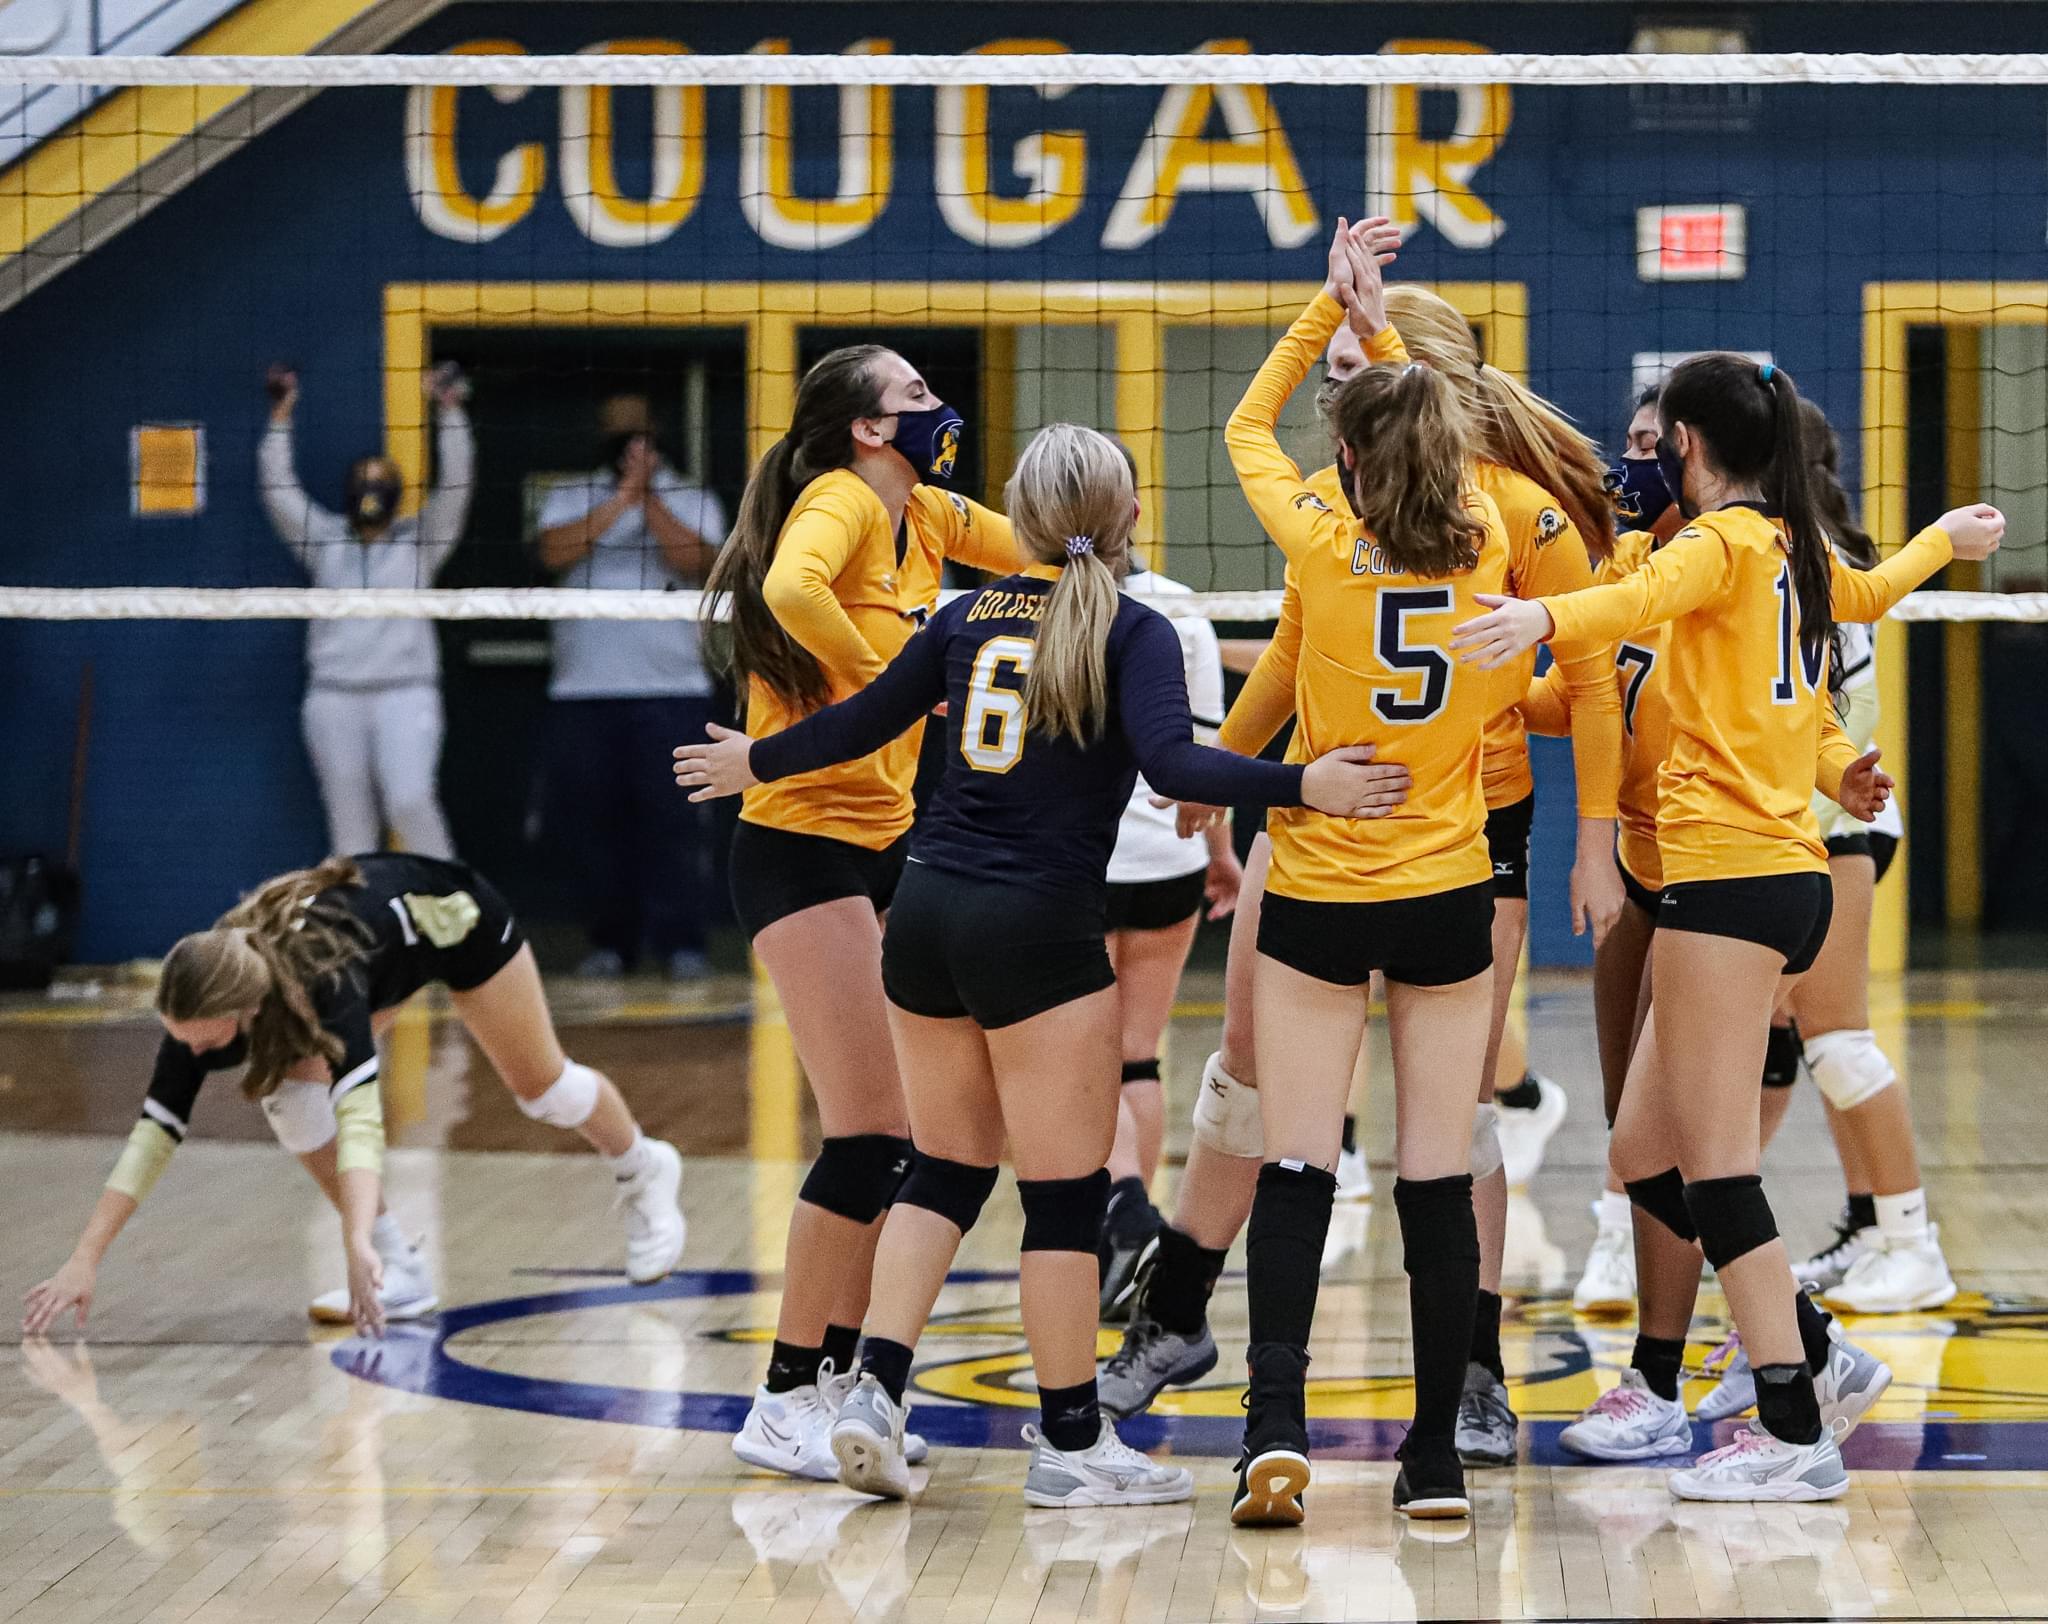 Volleyball: Goldsboro Wins Thriller Versus Clinton (PHOTO GALLERY)